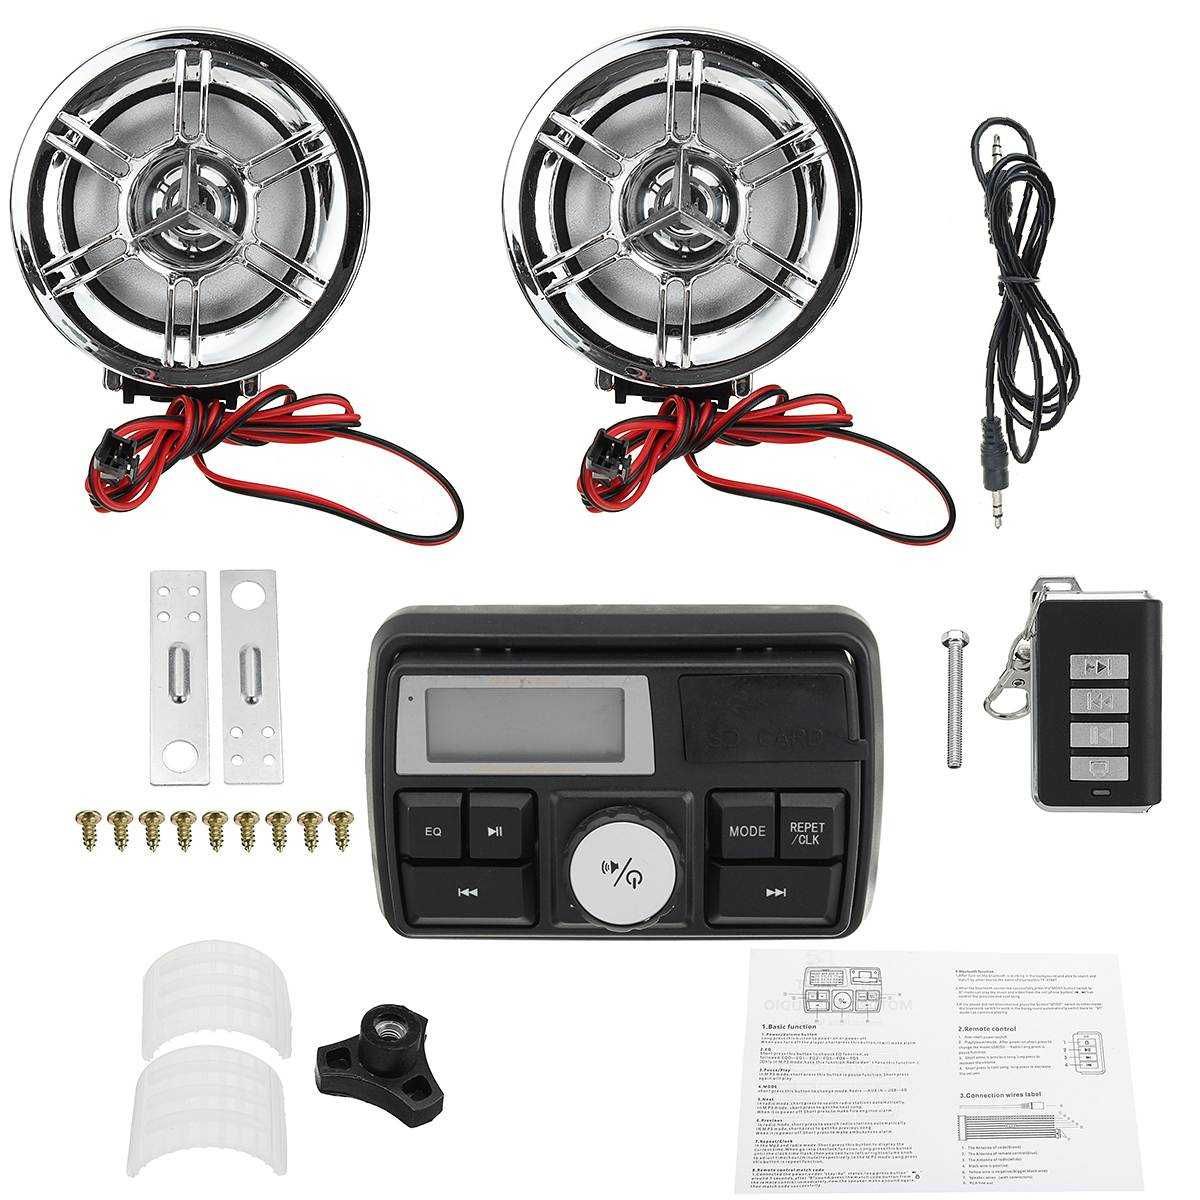 Bluetooth SD FM Radio moto ATV guidon système Audio USB Radio stéréo MP3 haut-parleurs pour Kawasaki/Honda/Suzuki